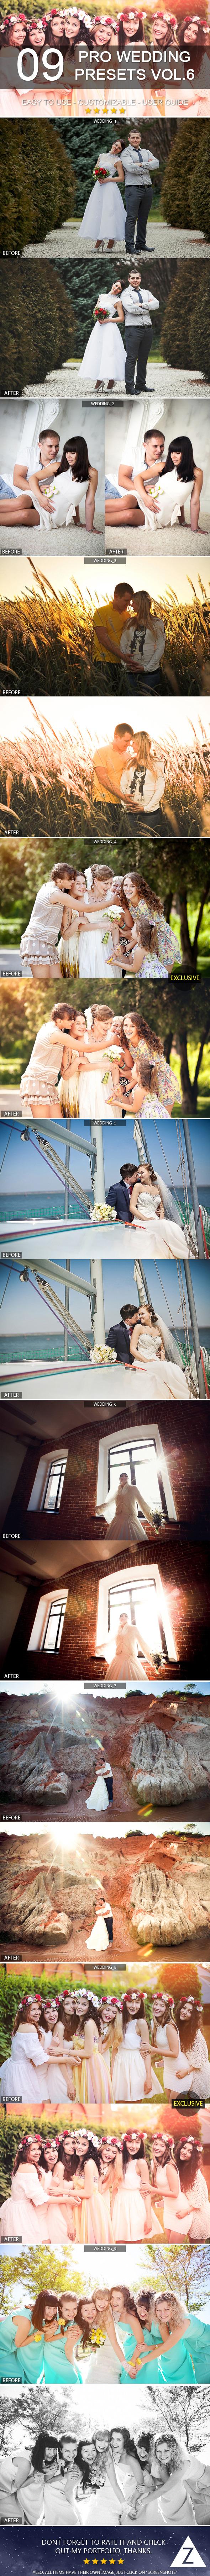 9 Pro Wedding Presets vol.6 - Lightroom Presets Add-ons